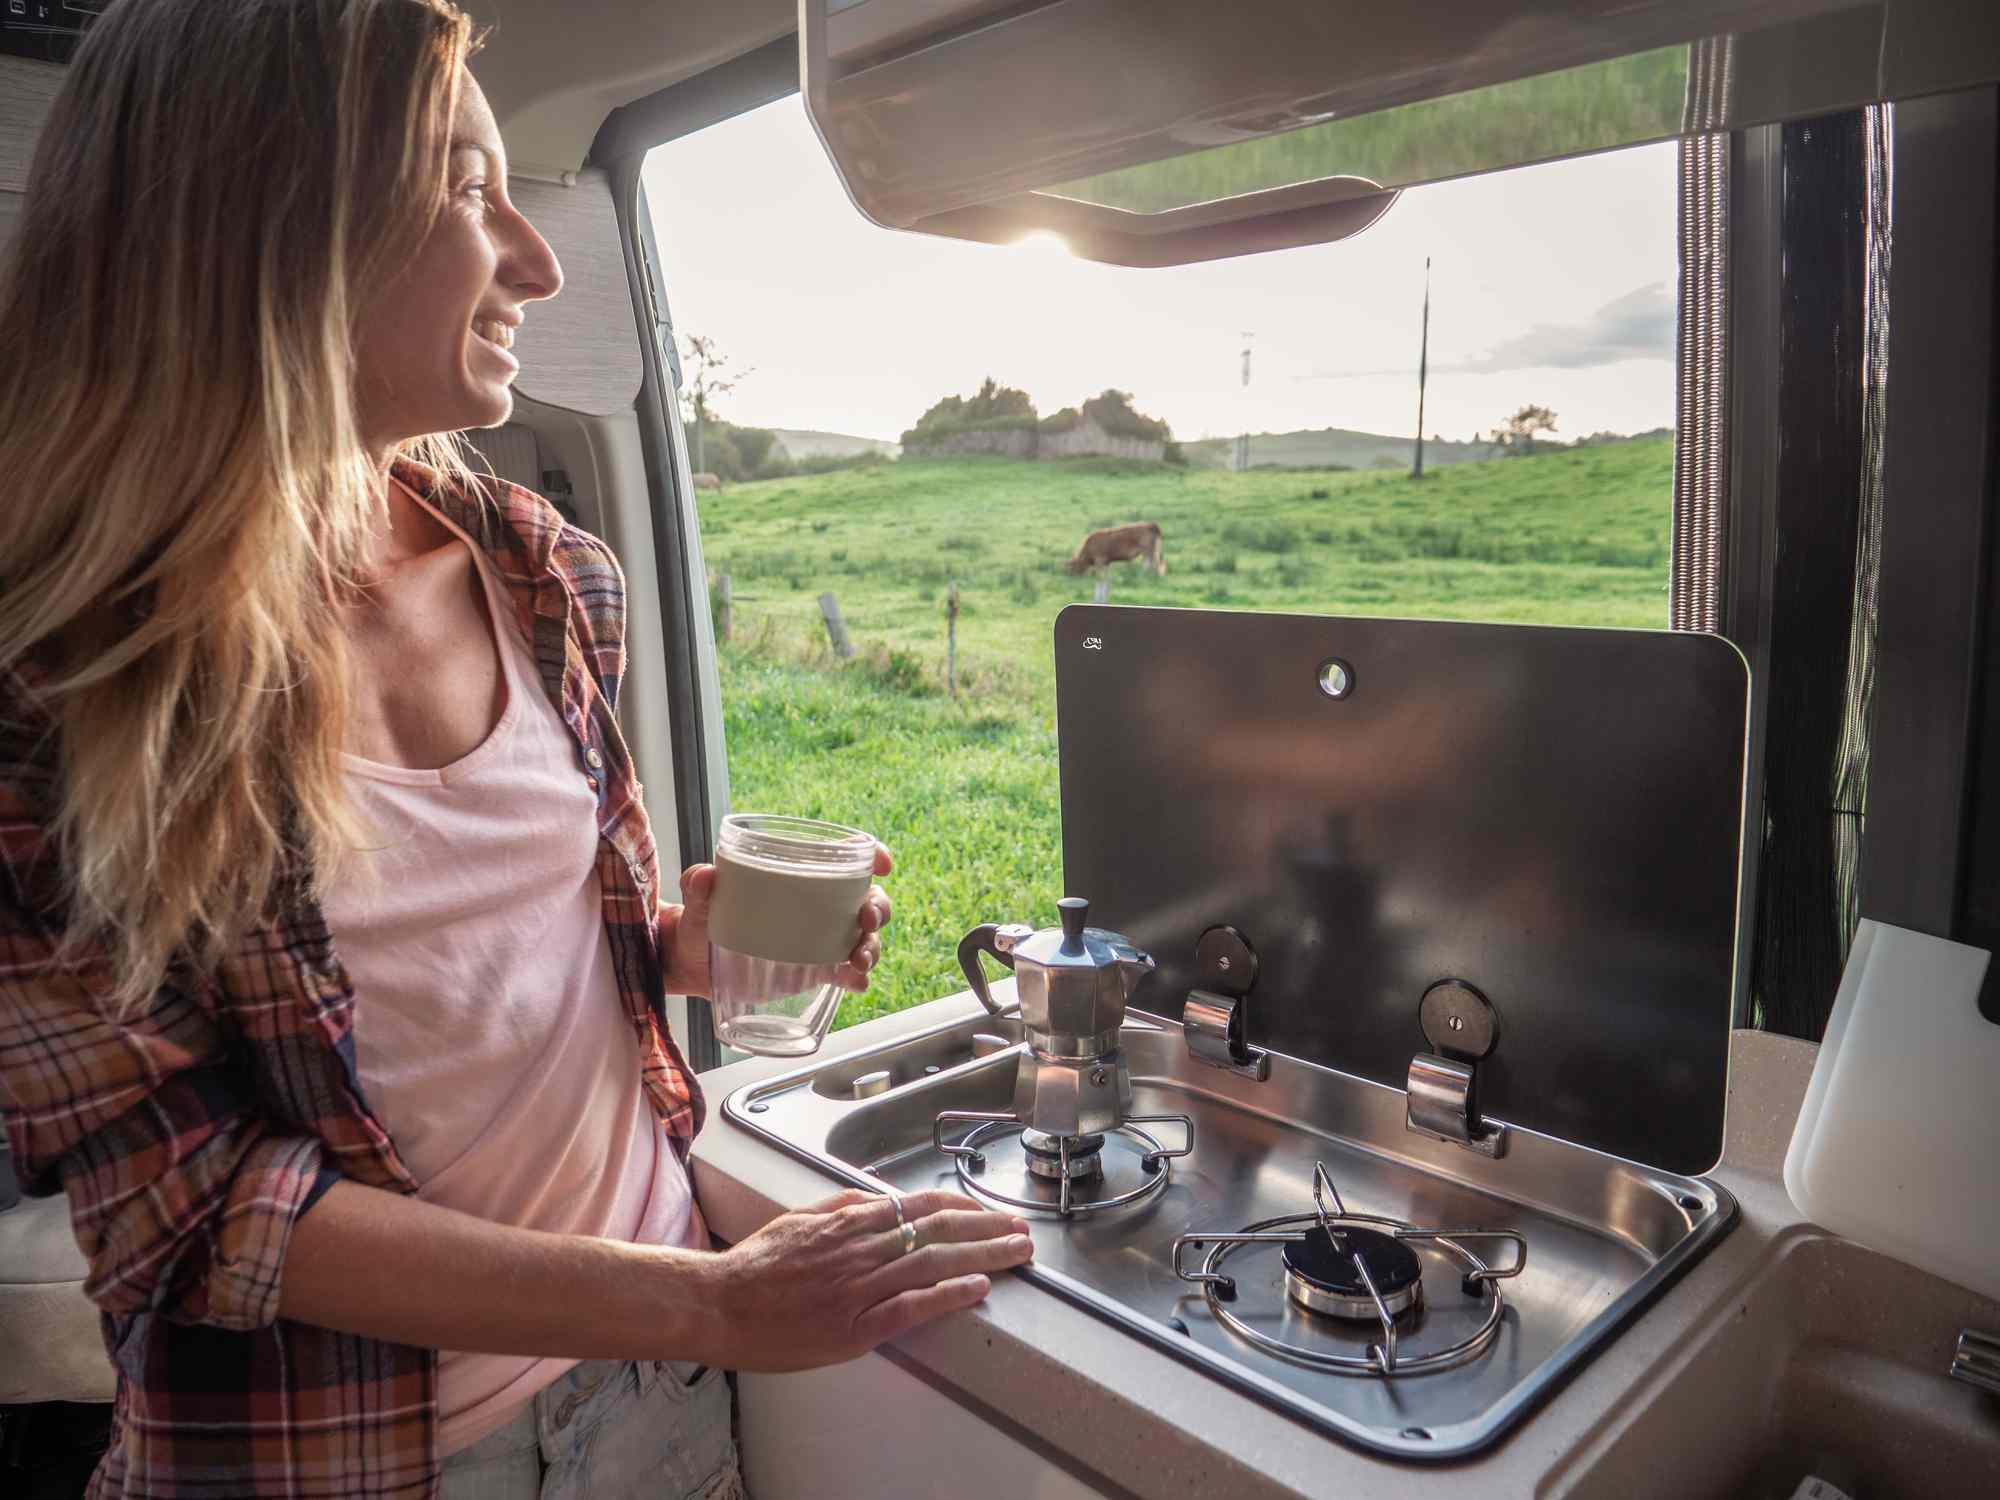 Person making coffee in motorhome with door open